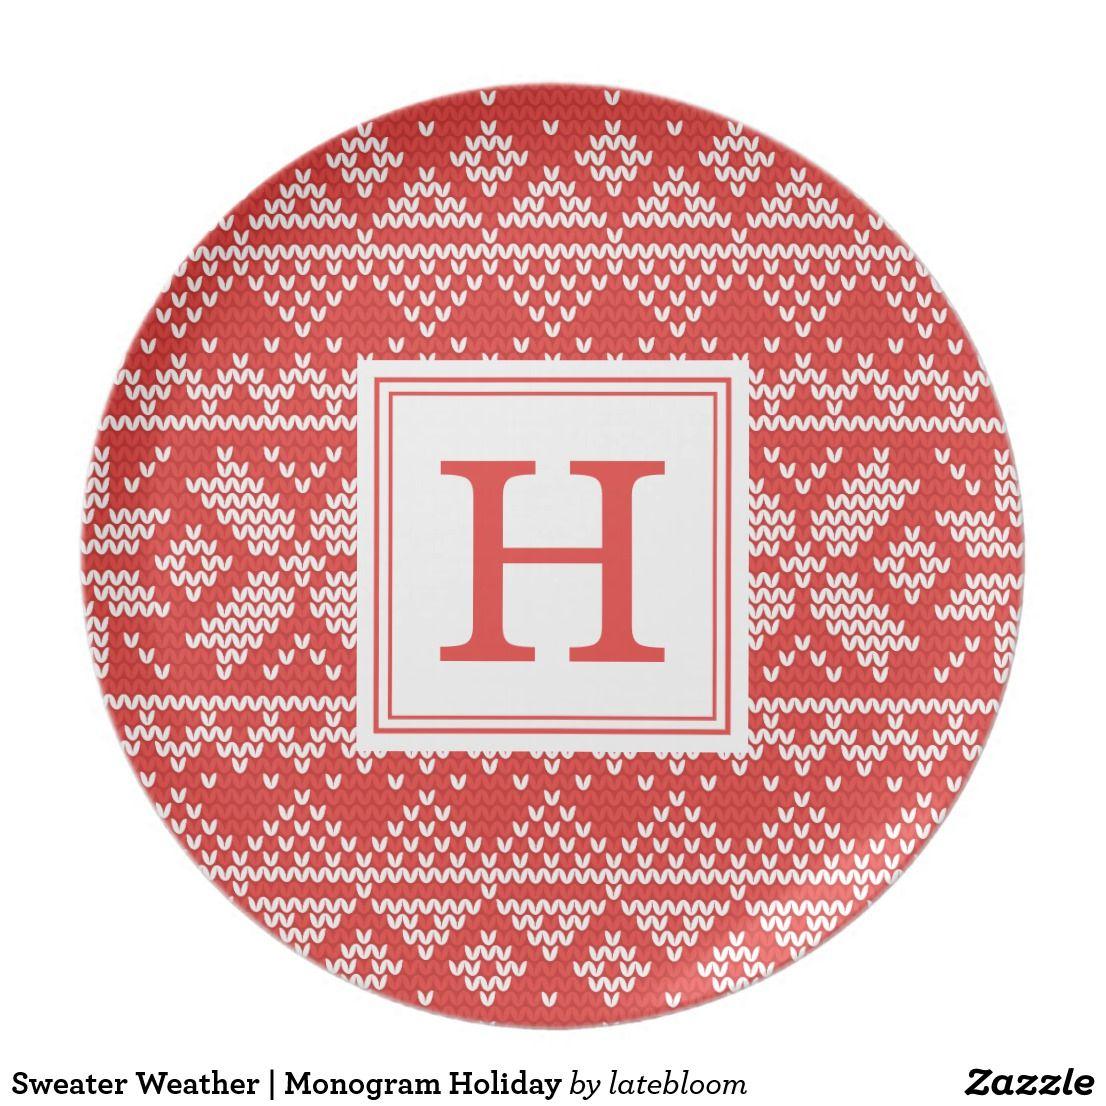 Sweater Weather | Monogram Holiday Melamine Plate  sc 1 st  Pinterest & Weather | Monogram Holiday Melamine Plate